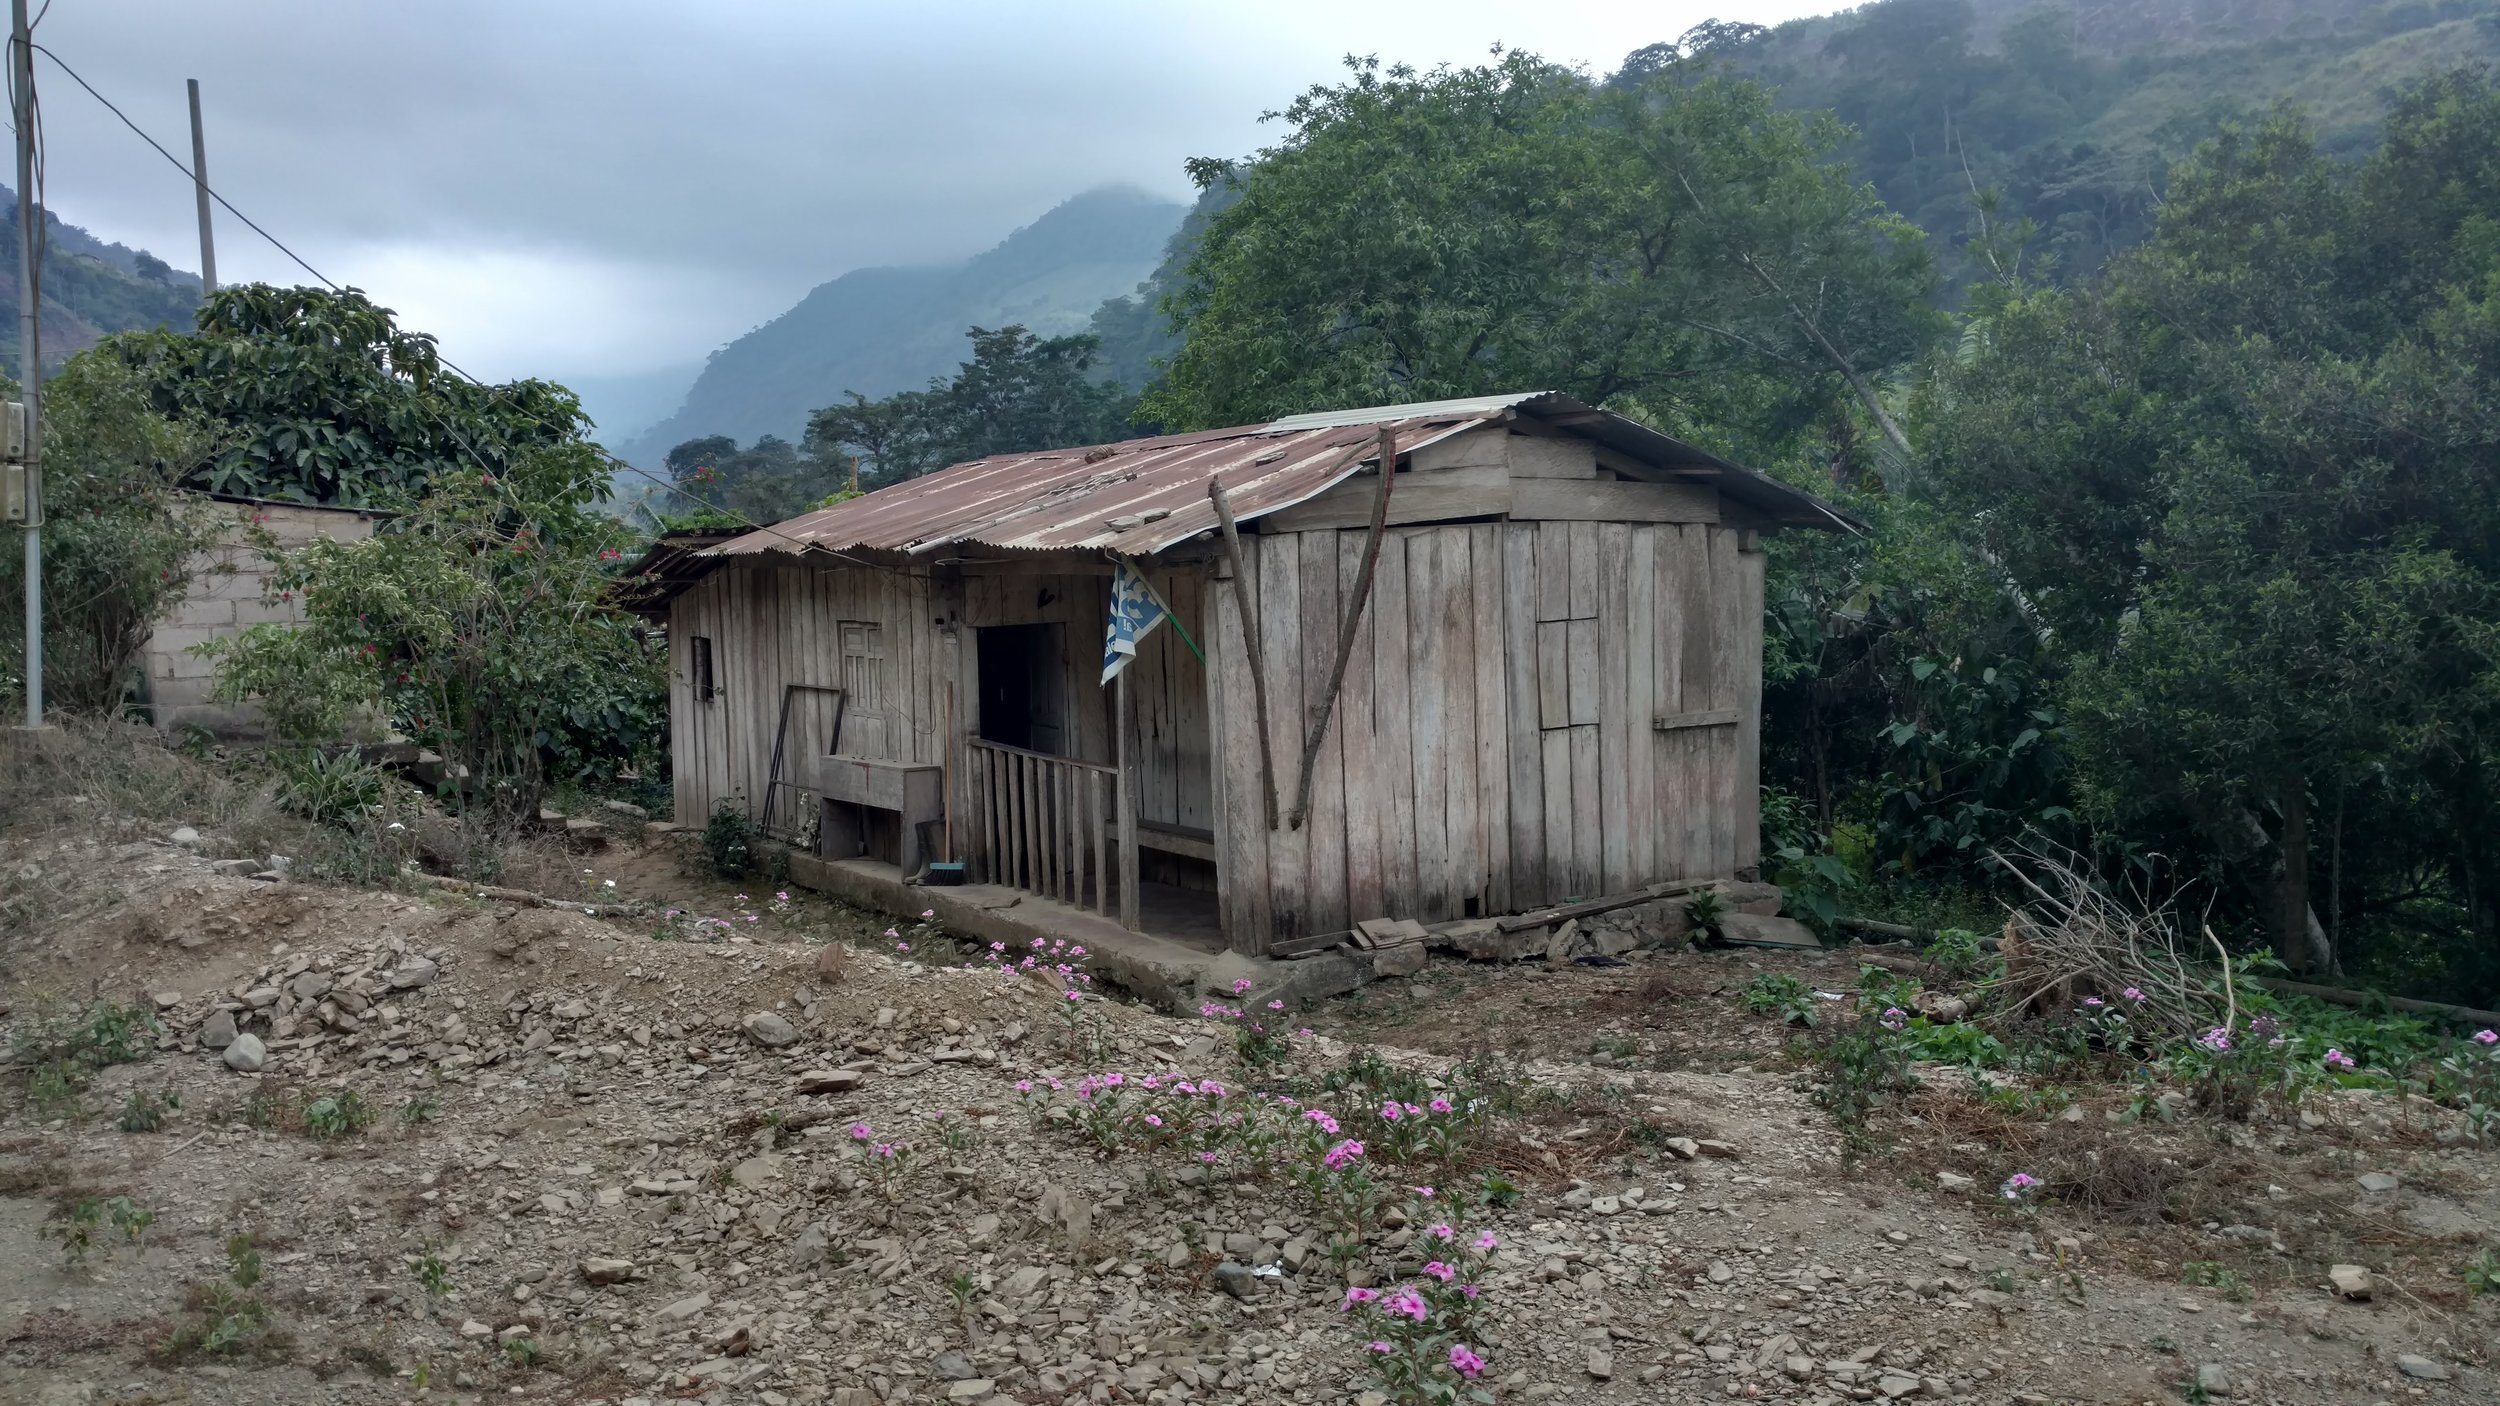 Marta's house in disrepair